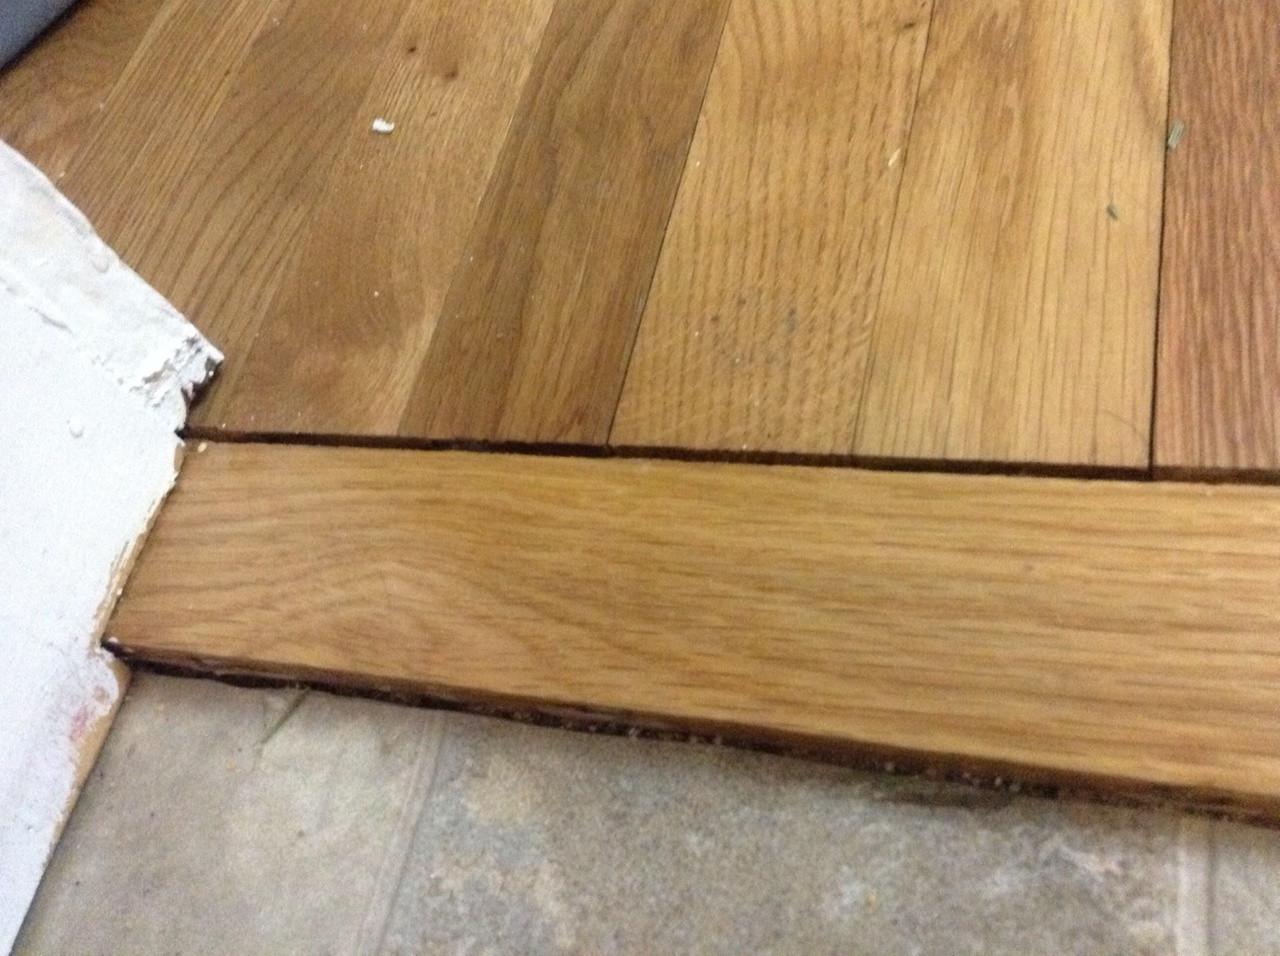 hardwood floor buffing pads of wood floor techniques 101 intended for gap shrinkage cork